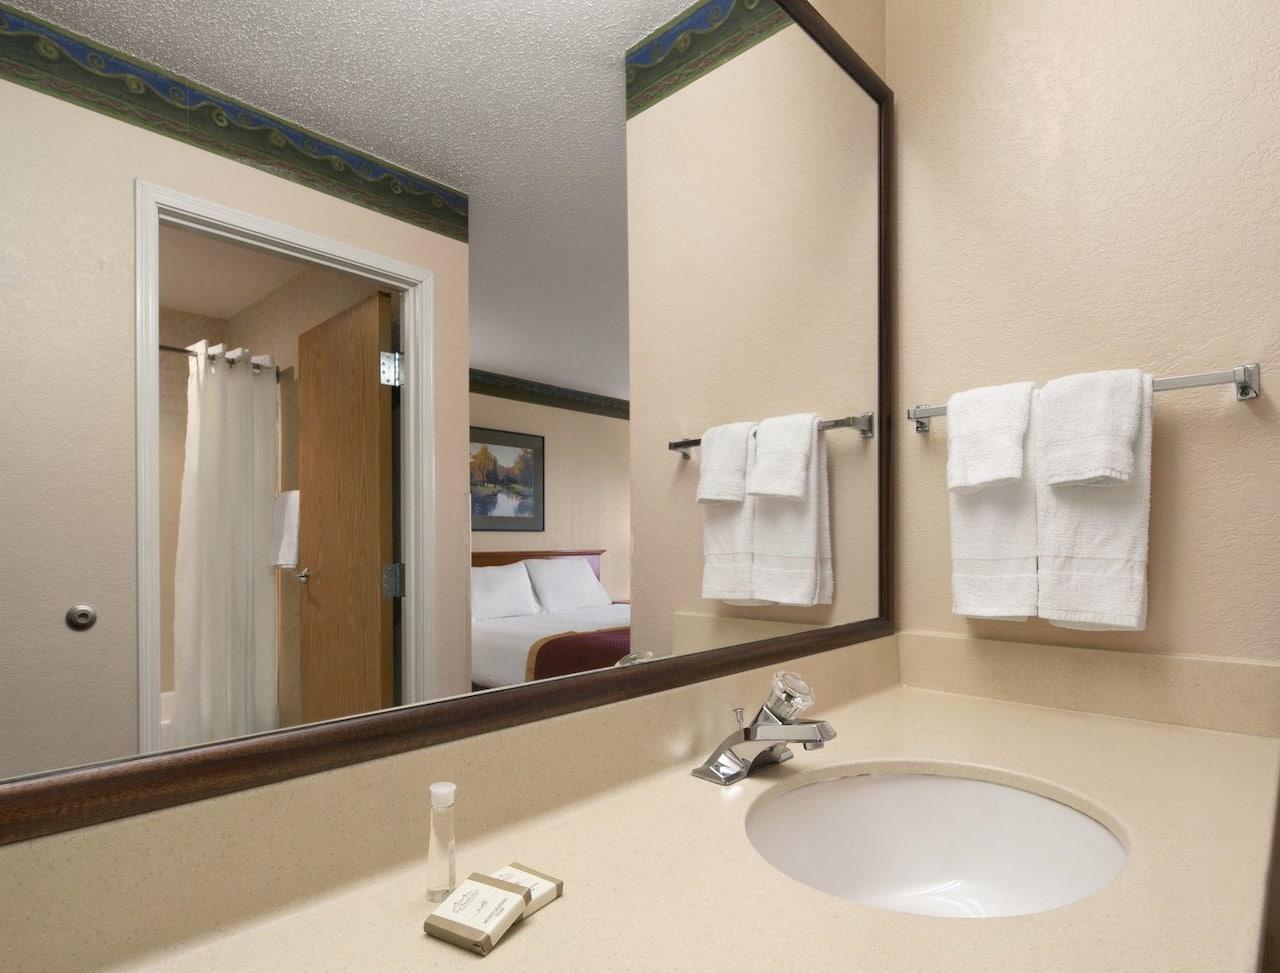 at the Baymont Inn & Suites DeKalb in DeKalb, Illinois